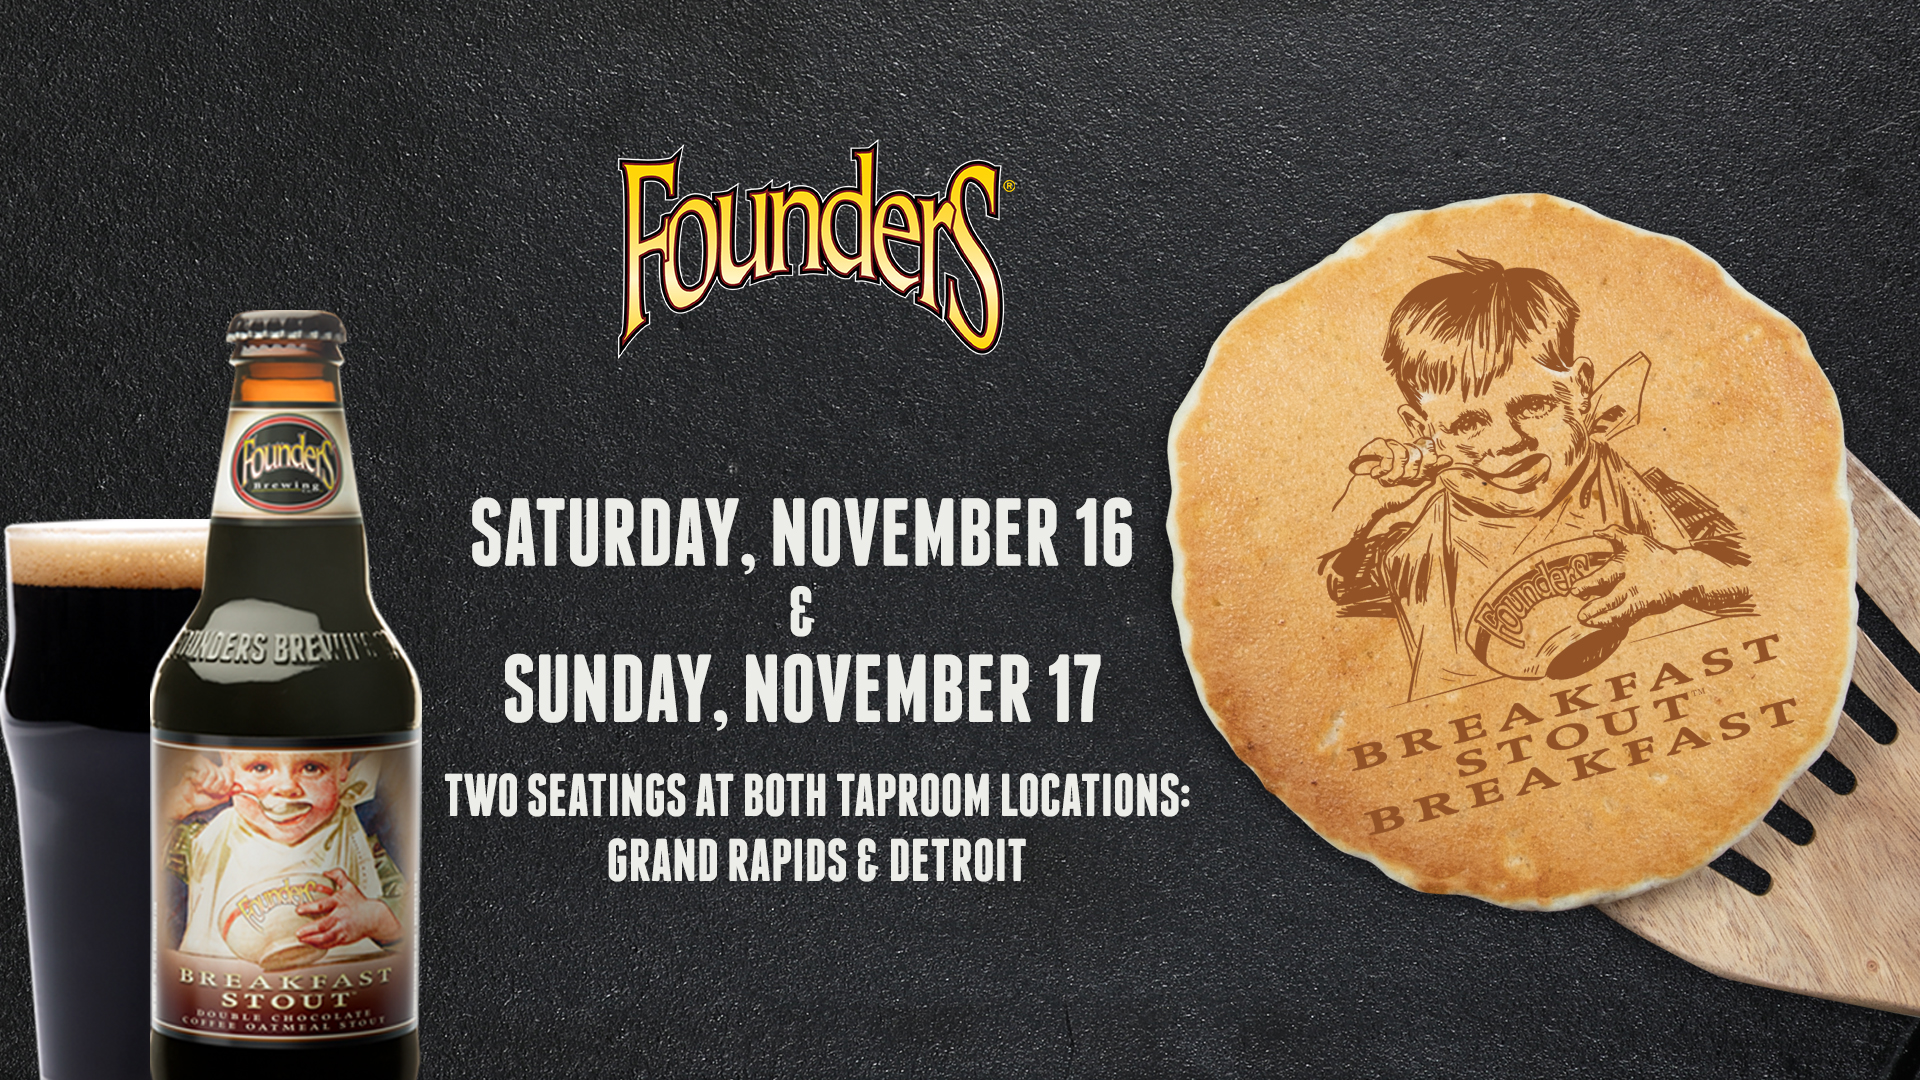 Founders Breakfast Stout Breakfast event banner